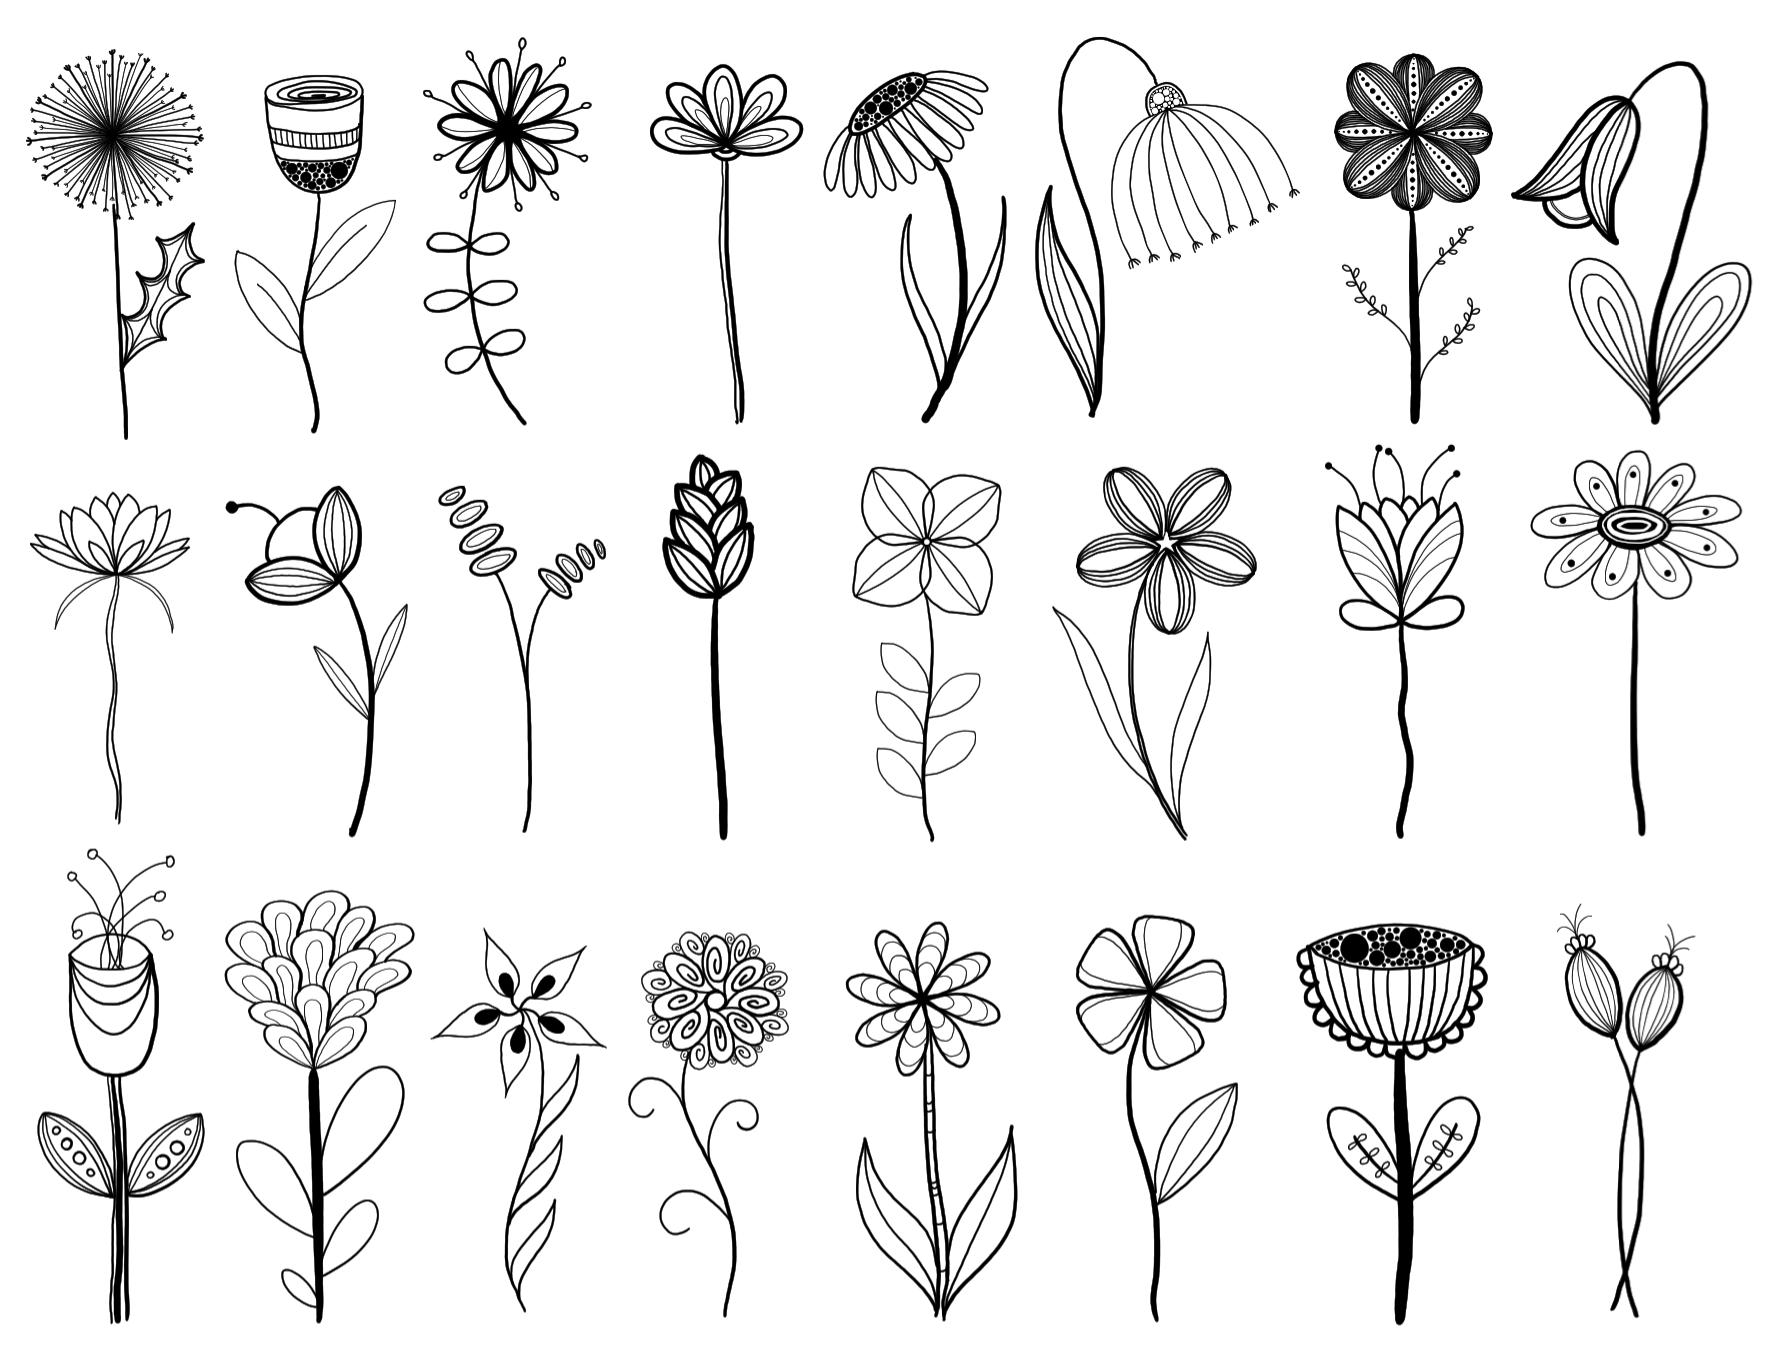 Line Art Flower : My original artwork inspired by many ️ doodle flower